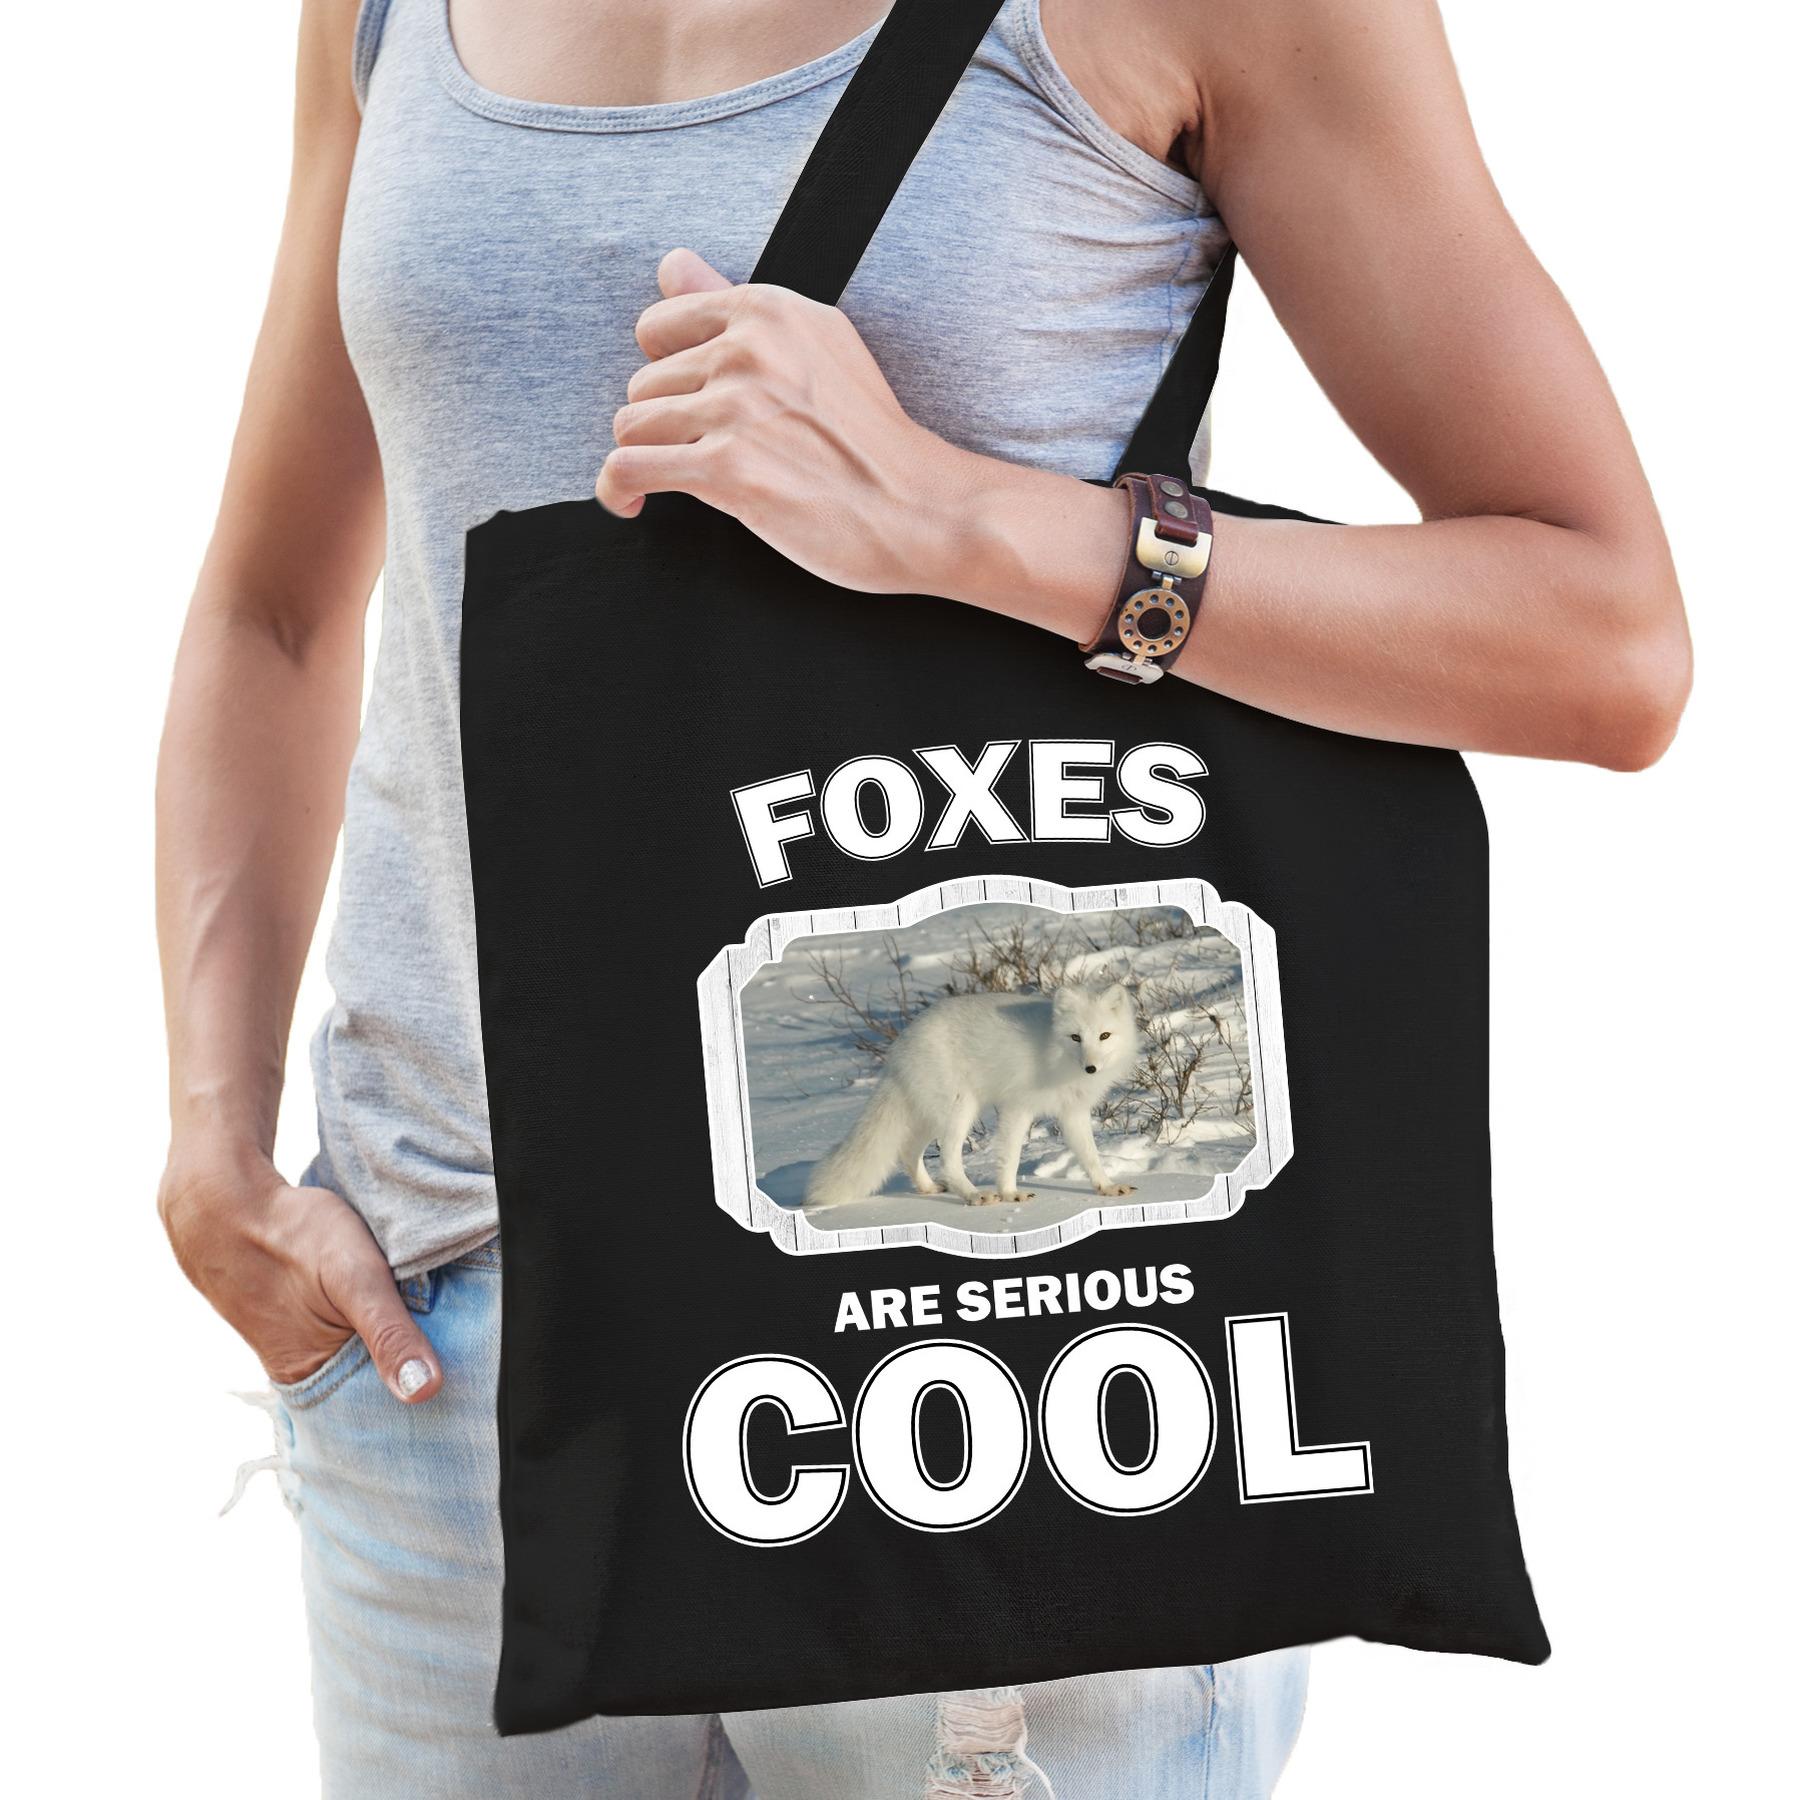 Katoenen tasje foxes are serious cool zwart - vossen/ poolvos cadeau tas